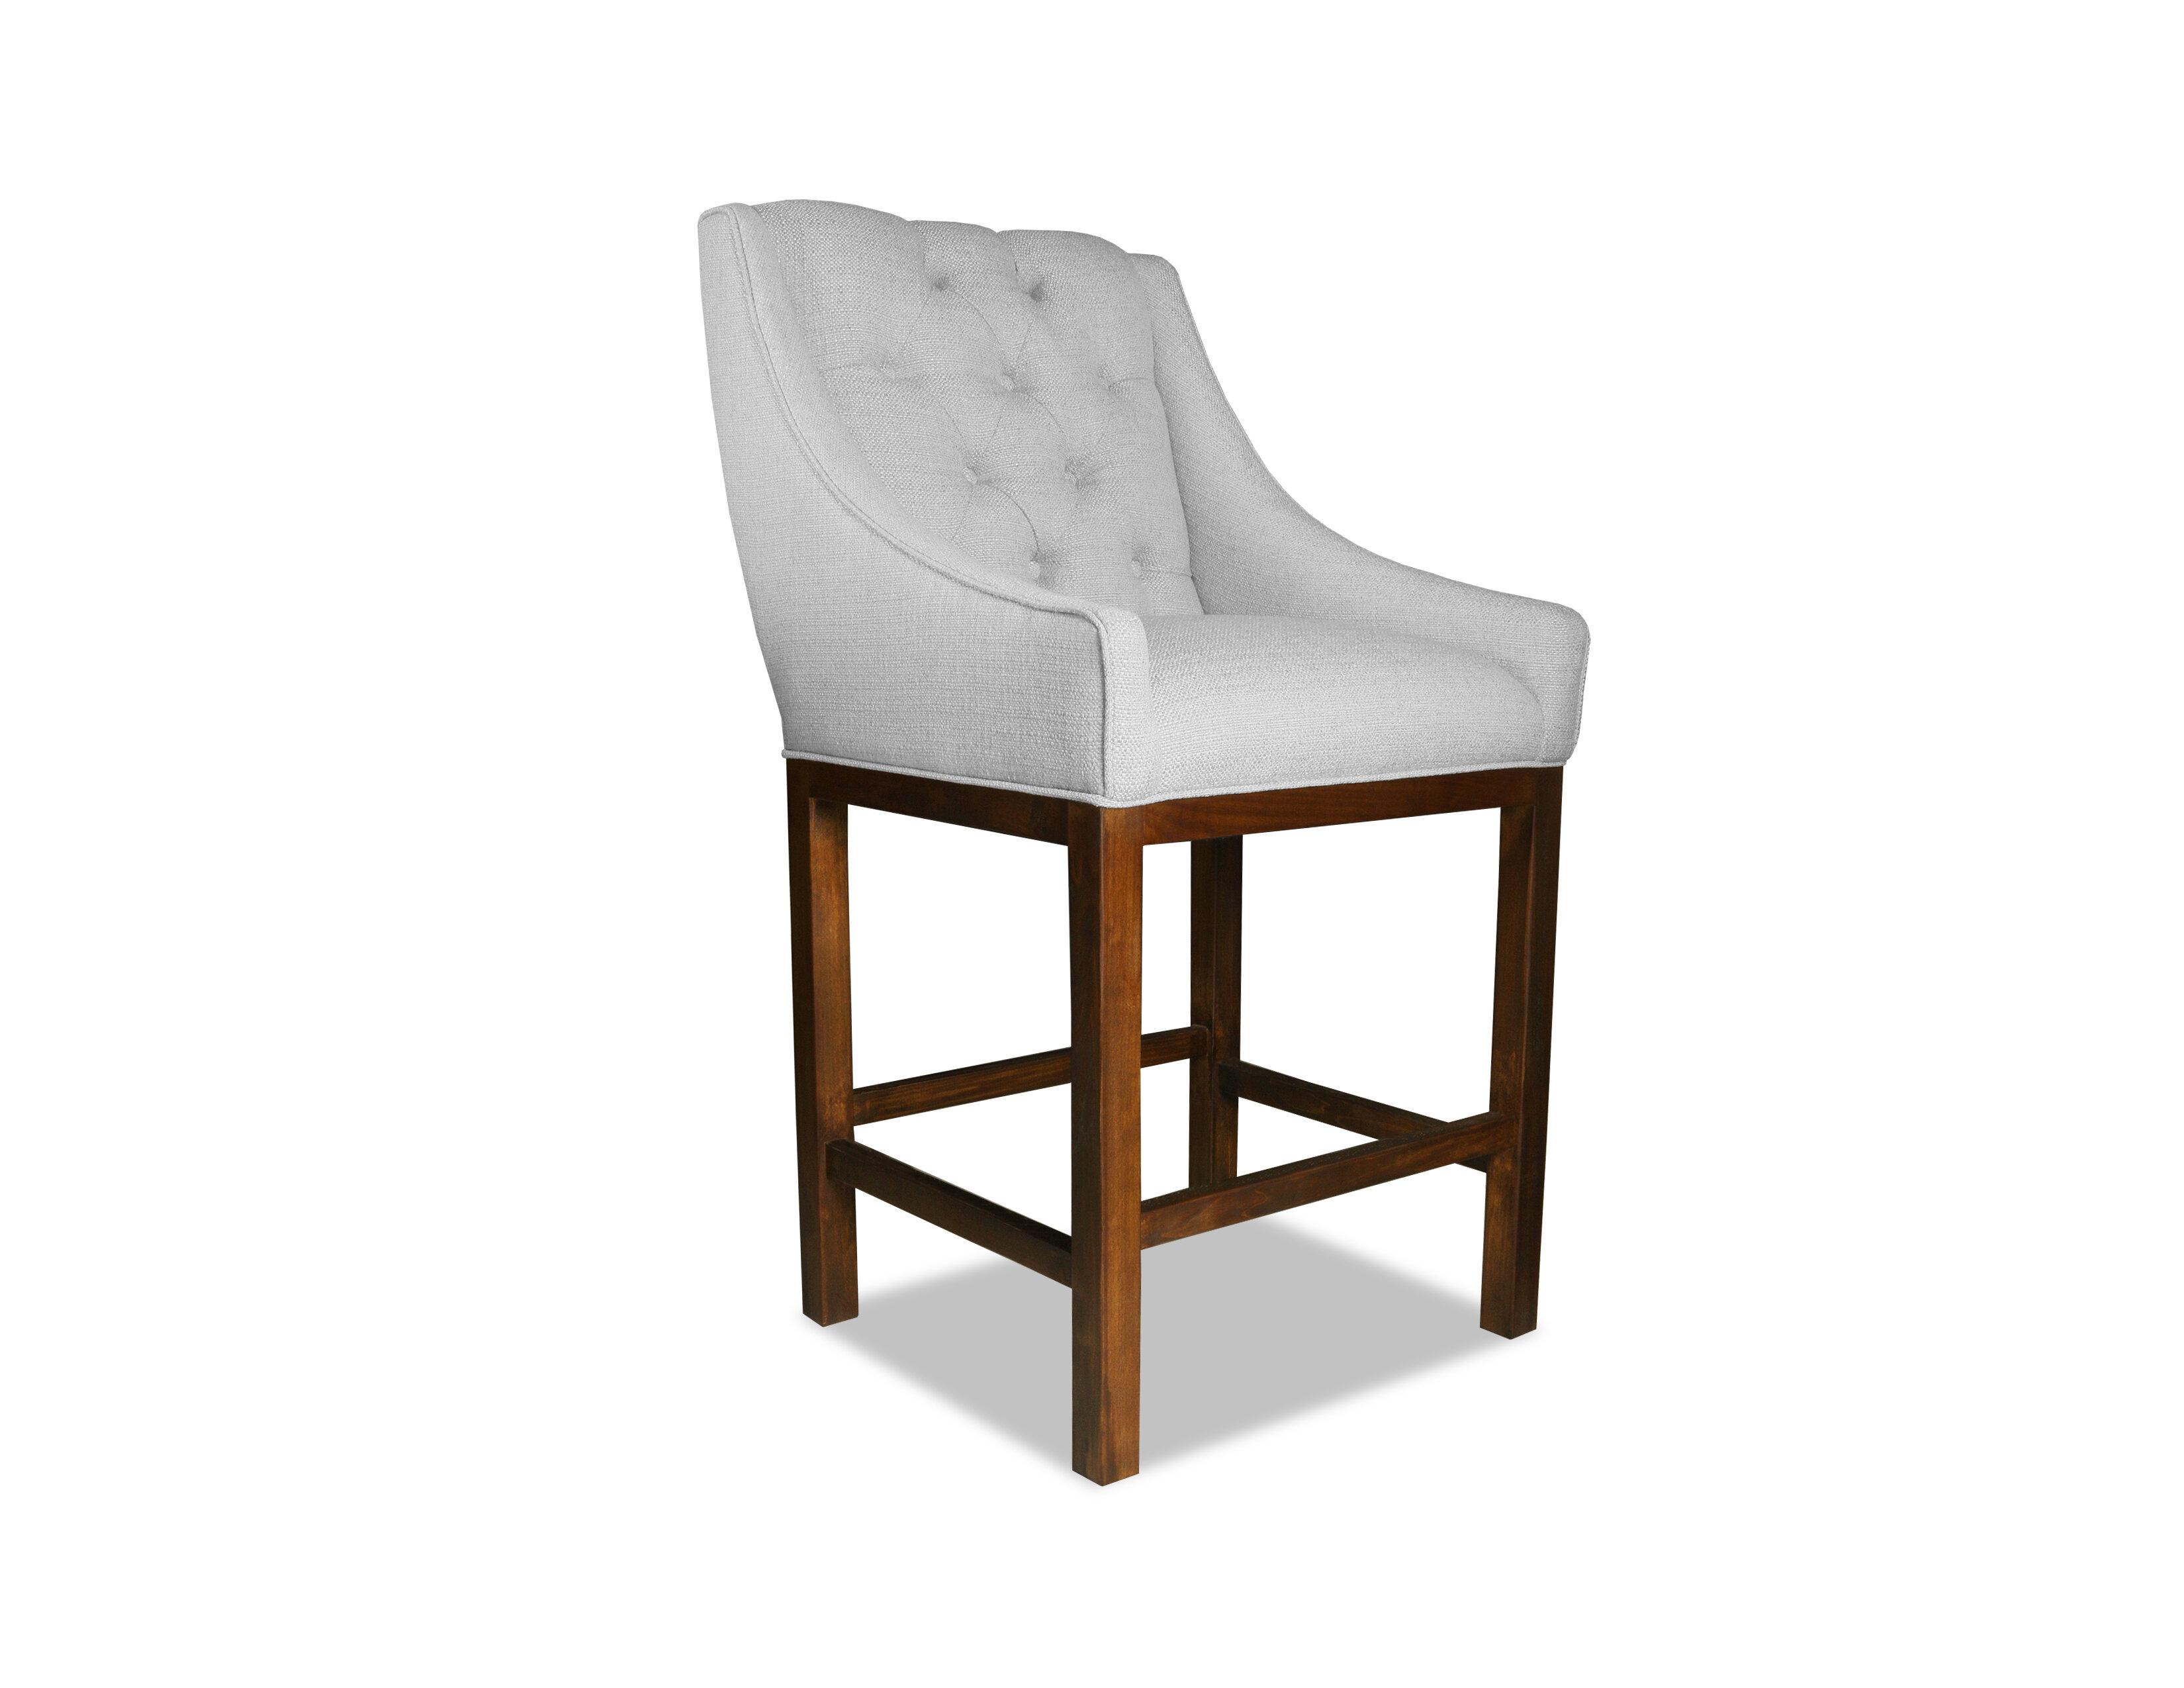 Enjoyable Haley 26 Bar Stool Caraccident5 Cool Chair Designs And Ideas Caraccident5Info